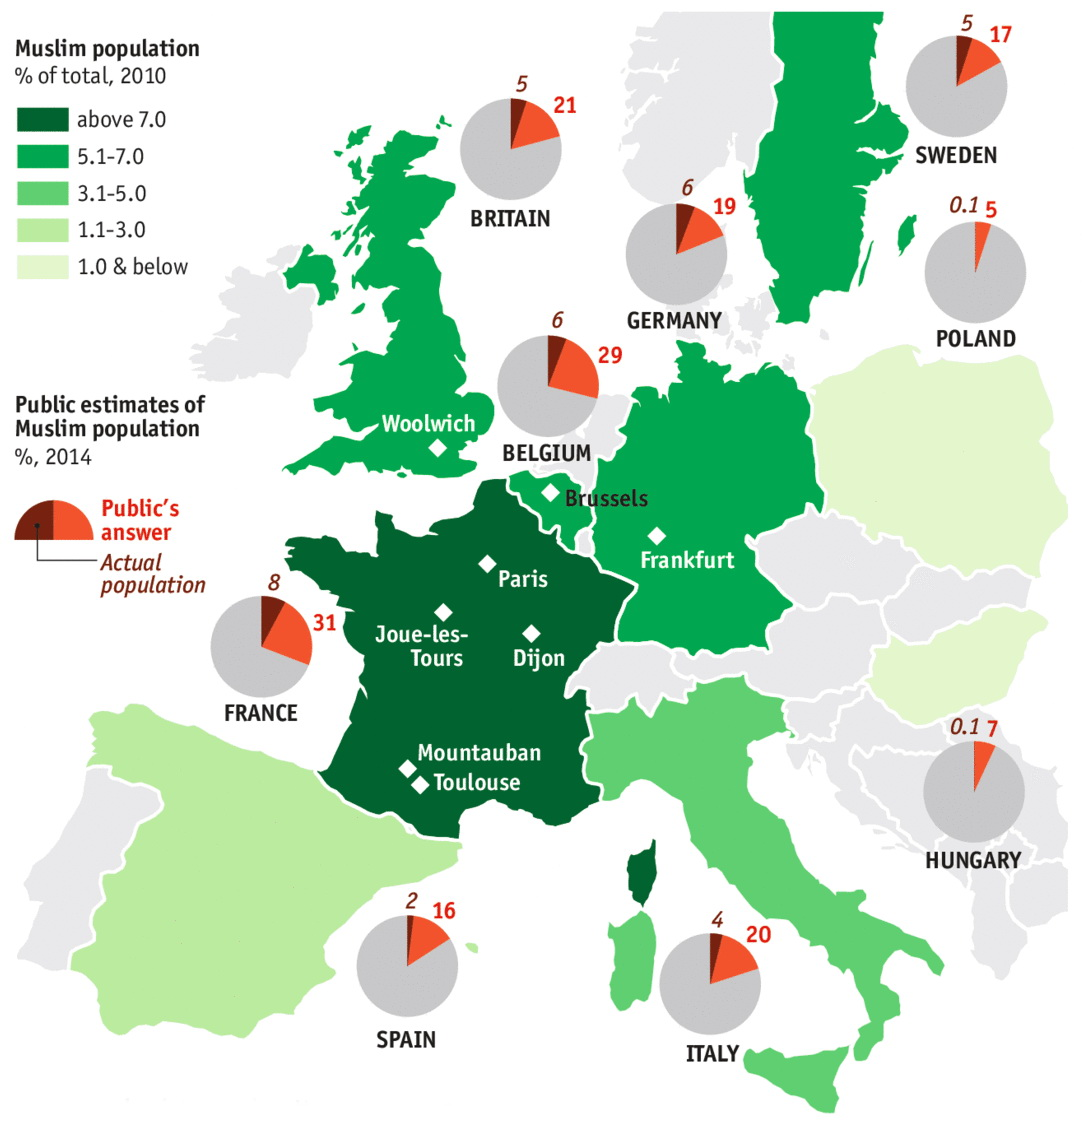 musulmani in Europa, mappa dell'Europa